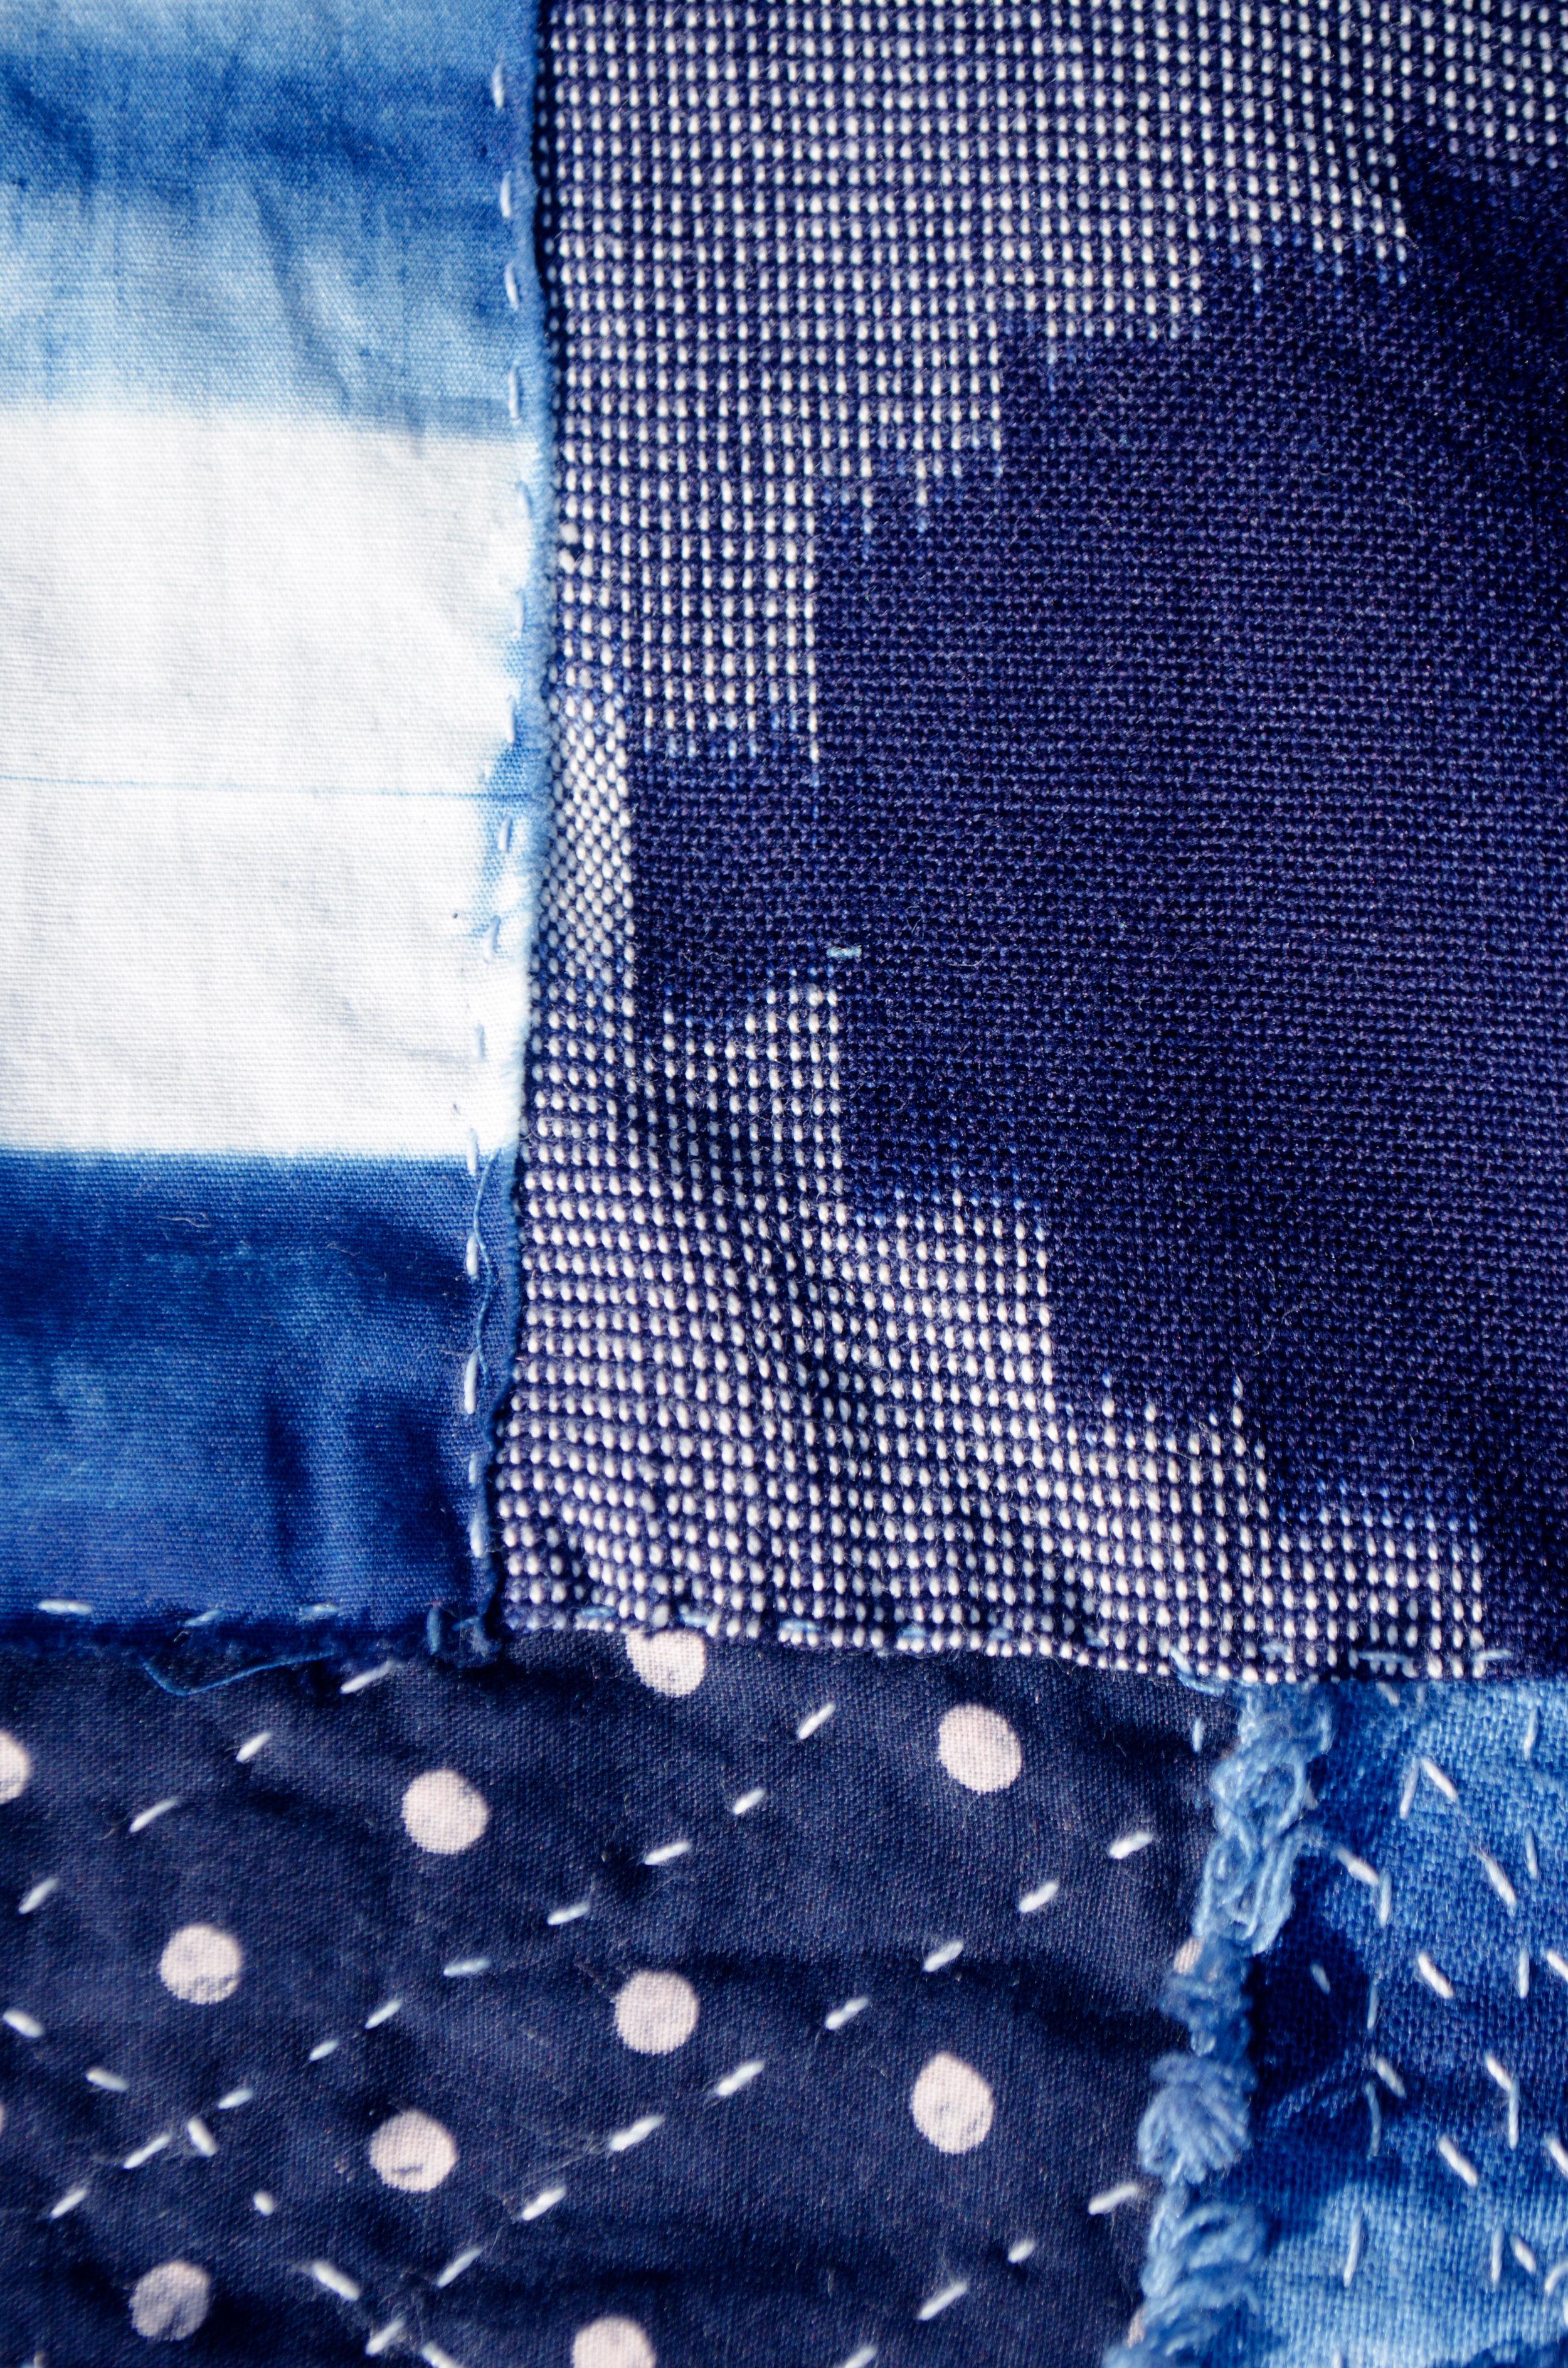 Stitching around resist dyed indigo dots